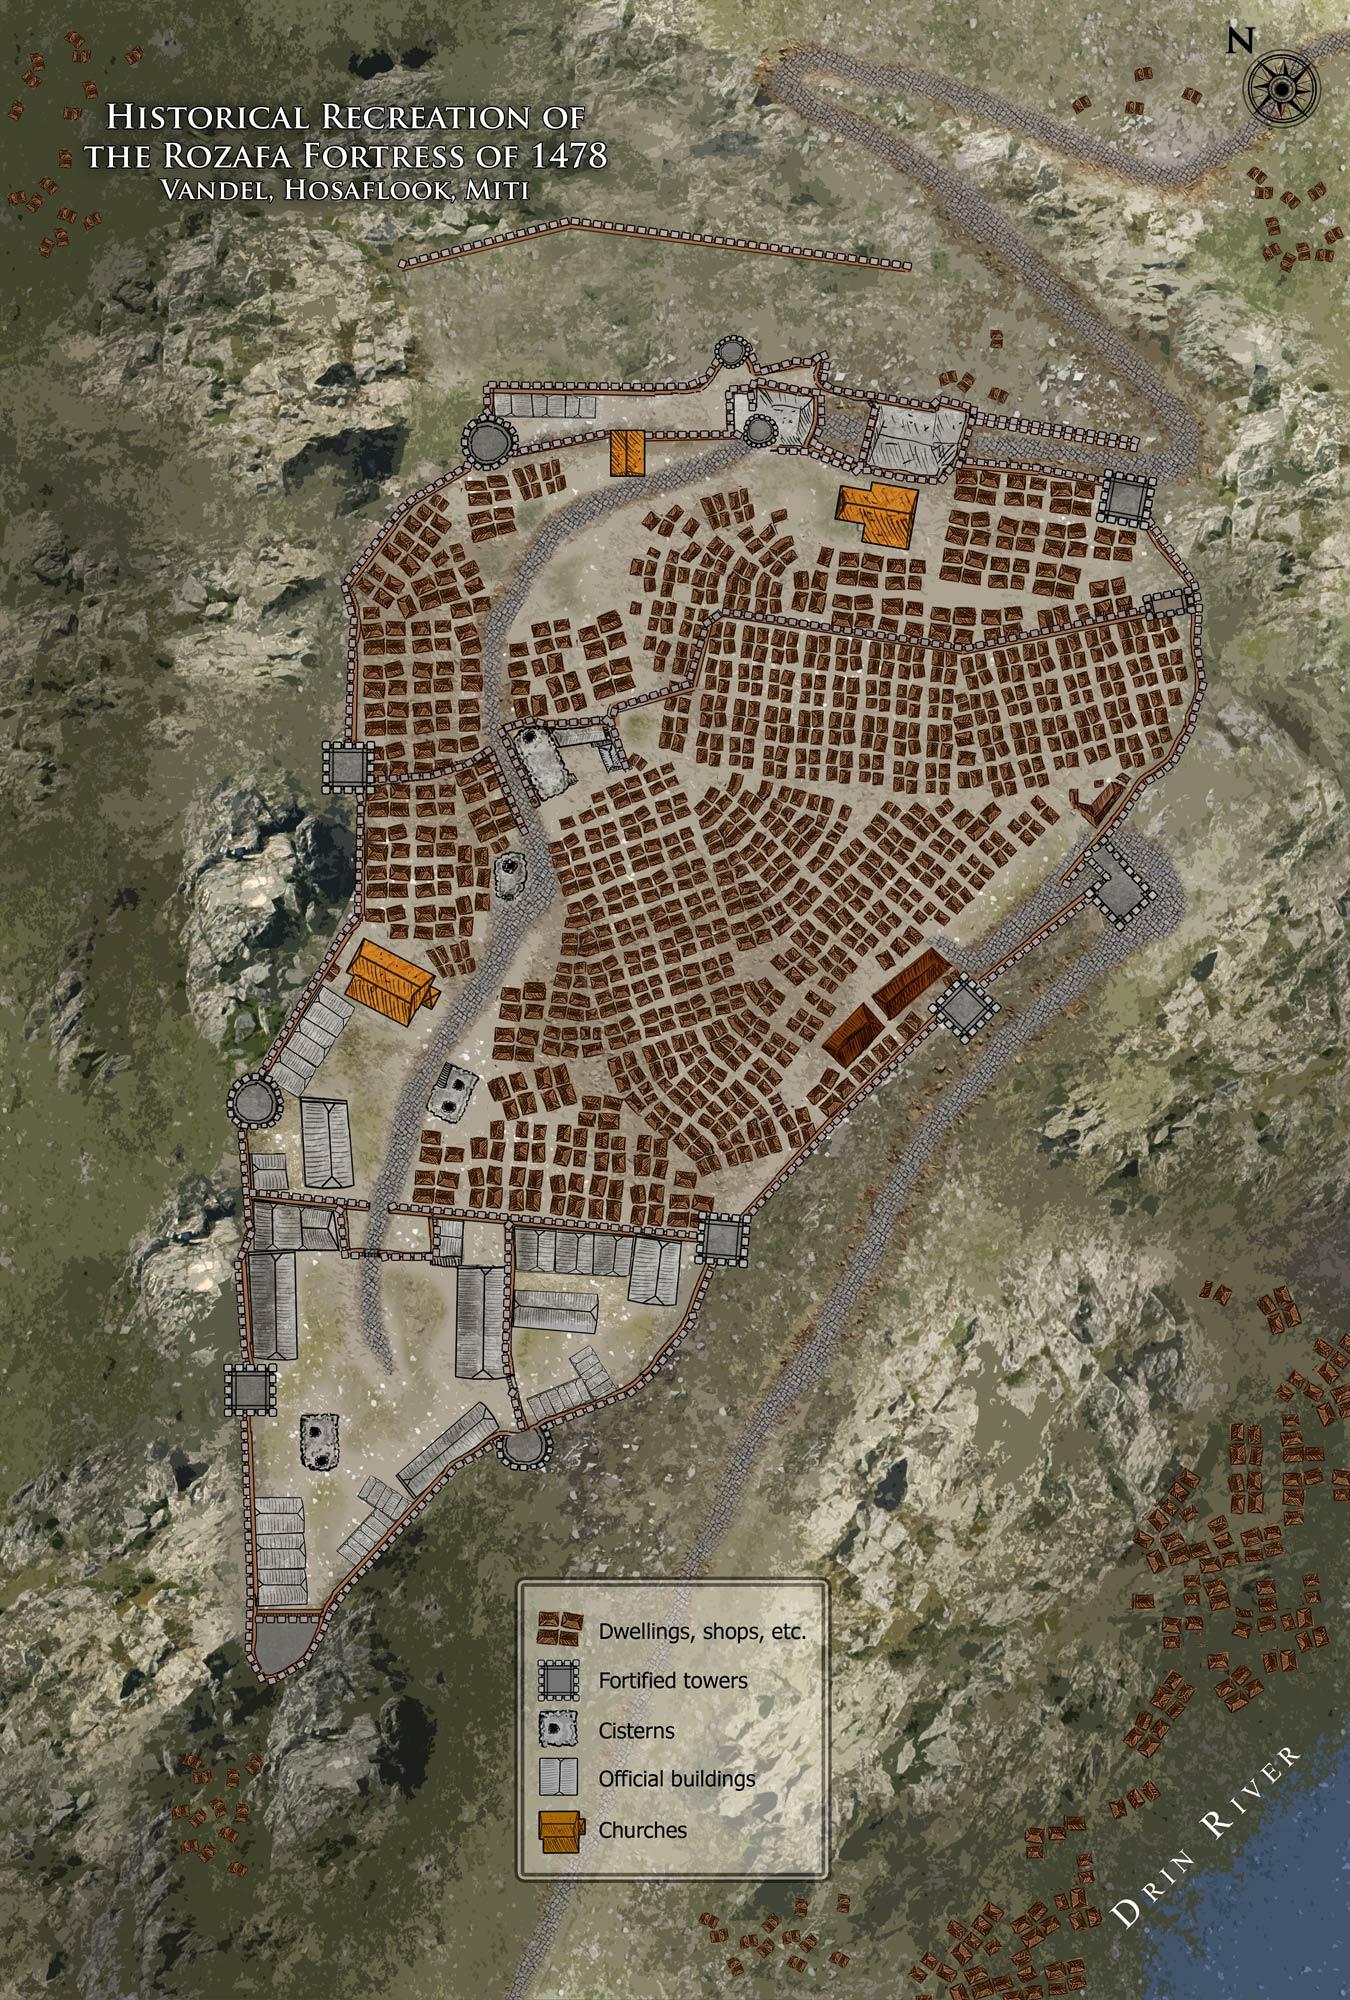 Fortress of Shkodra